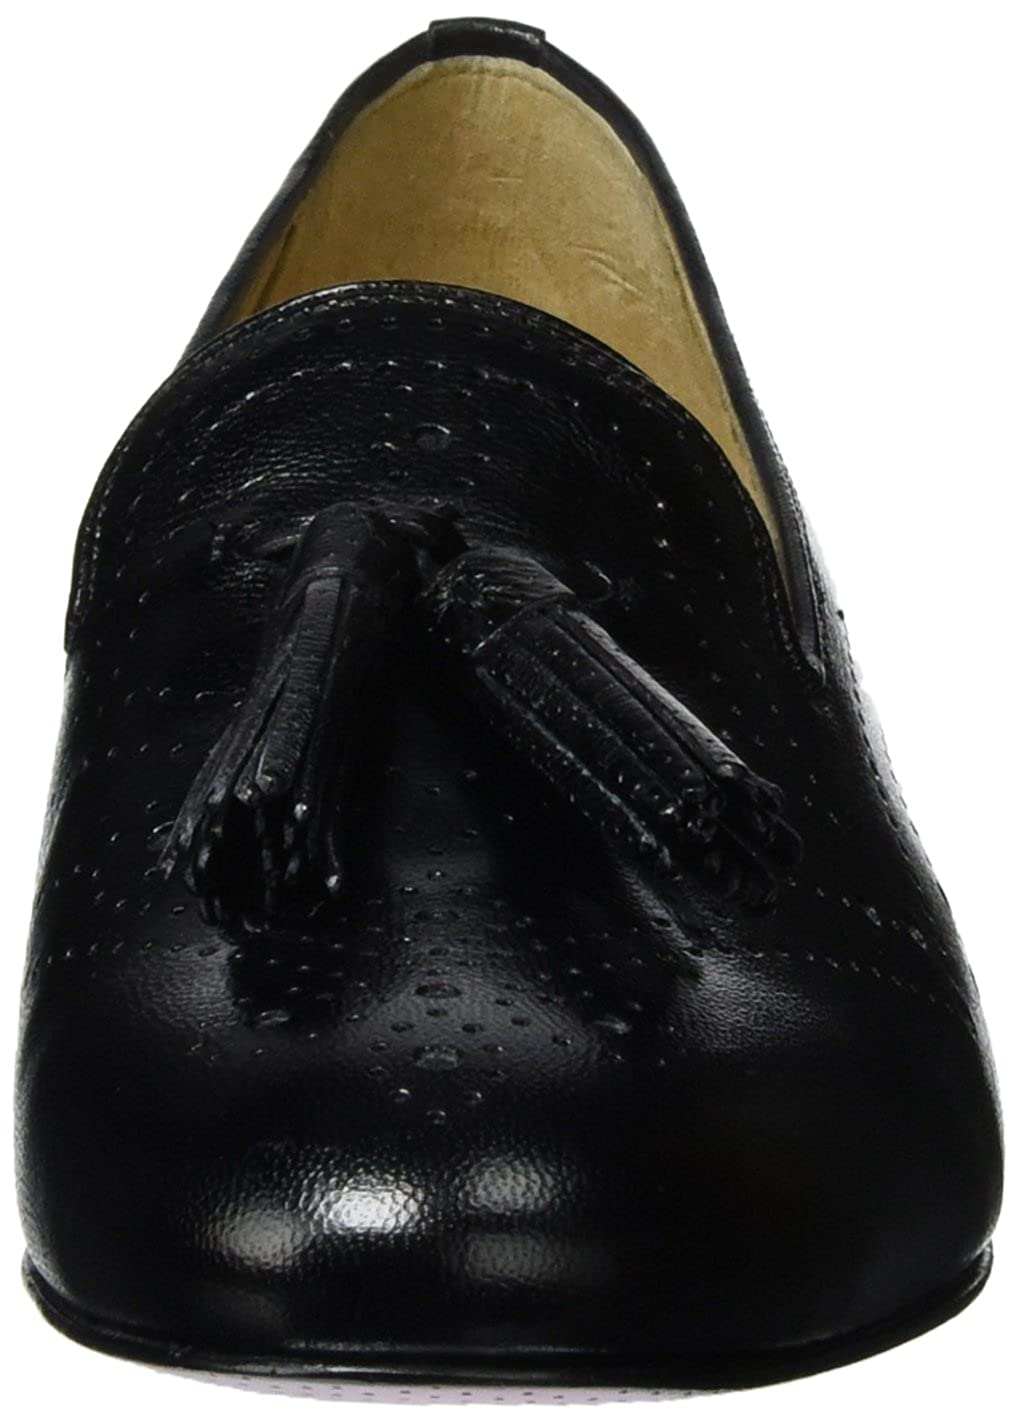 MELVIN & Schuhe HAMILTON MH HAND MADE Schuhe & OF CLASS Damen Mila 10 Slipper Schwarz (Salerno schwarz / schwarz Perfo M&h Ls-nat.) 433d31